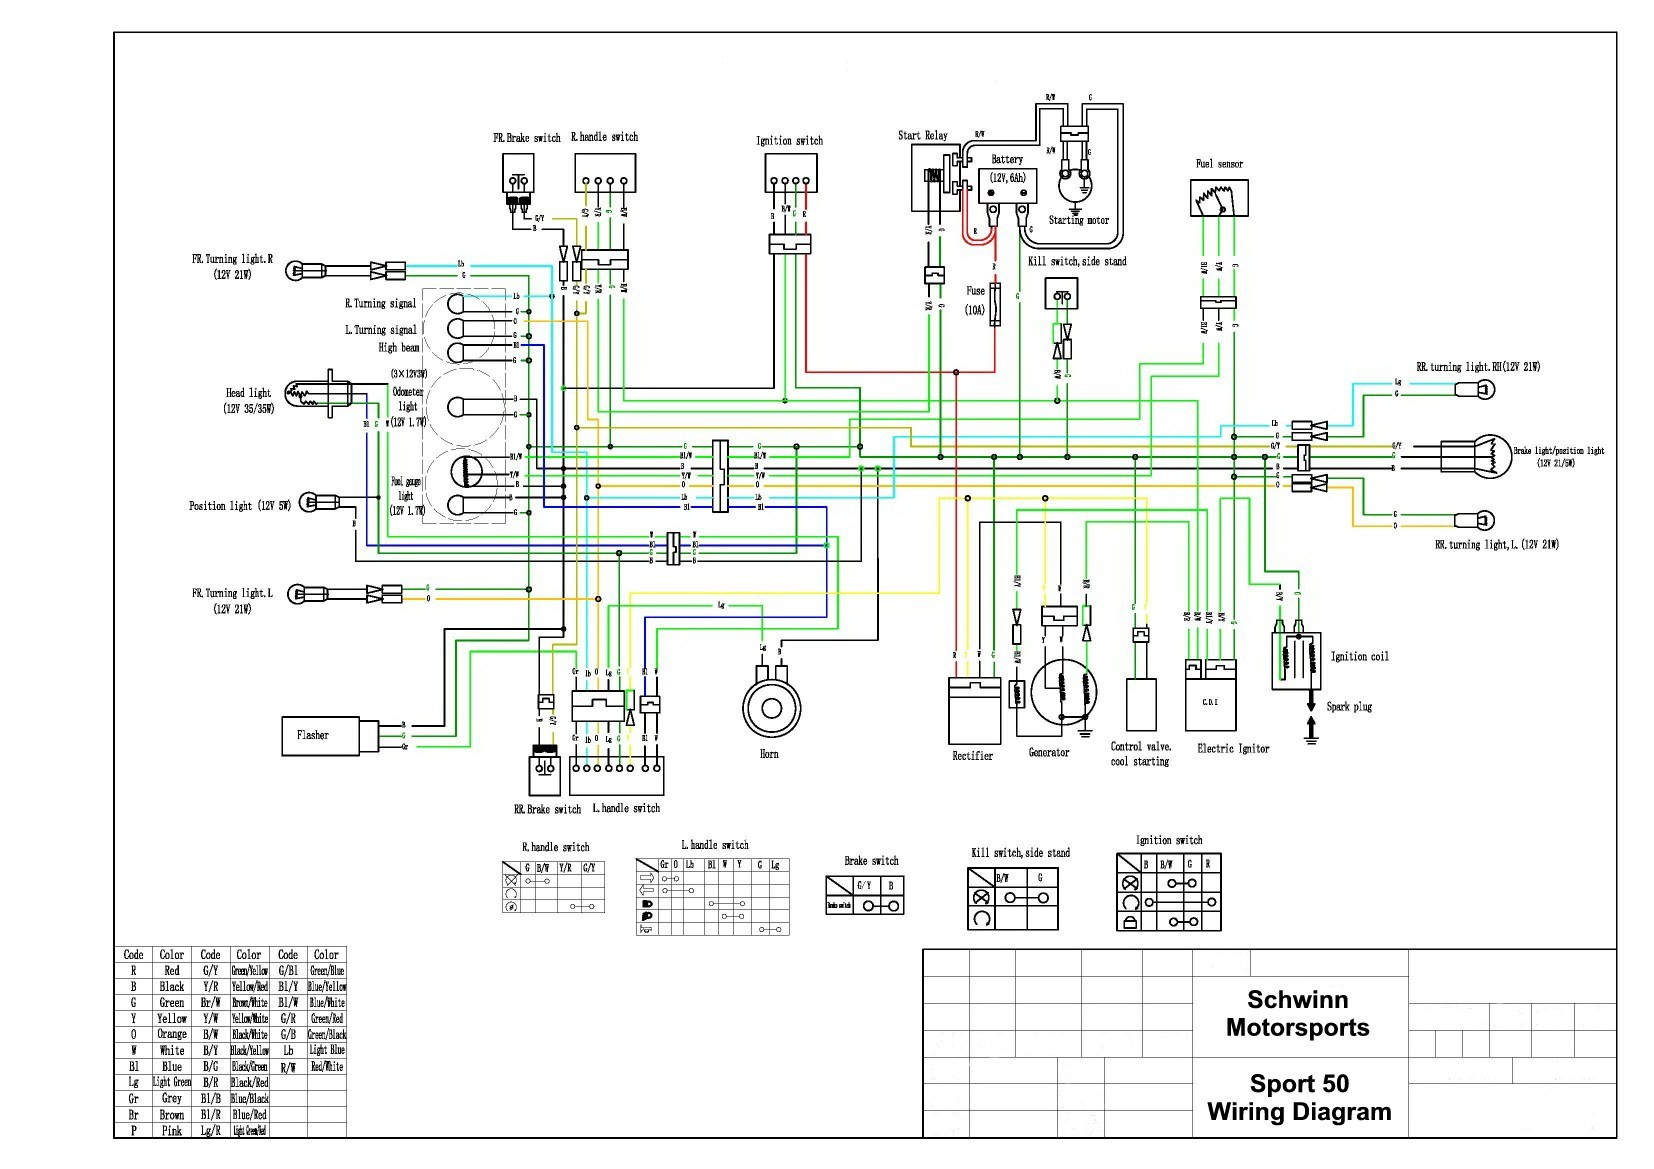 Amp Research Power Step Wiring Diagram Hoveround Wiring Diagram Of Amp Research Power Step Wiring Diagram F099f Range Rover Denso Radio Wiring Schematics 2007